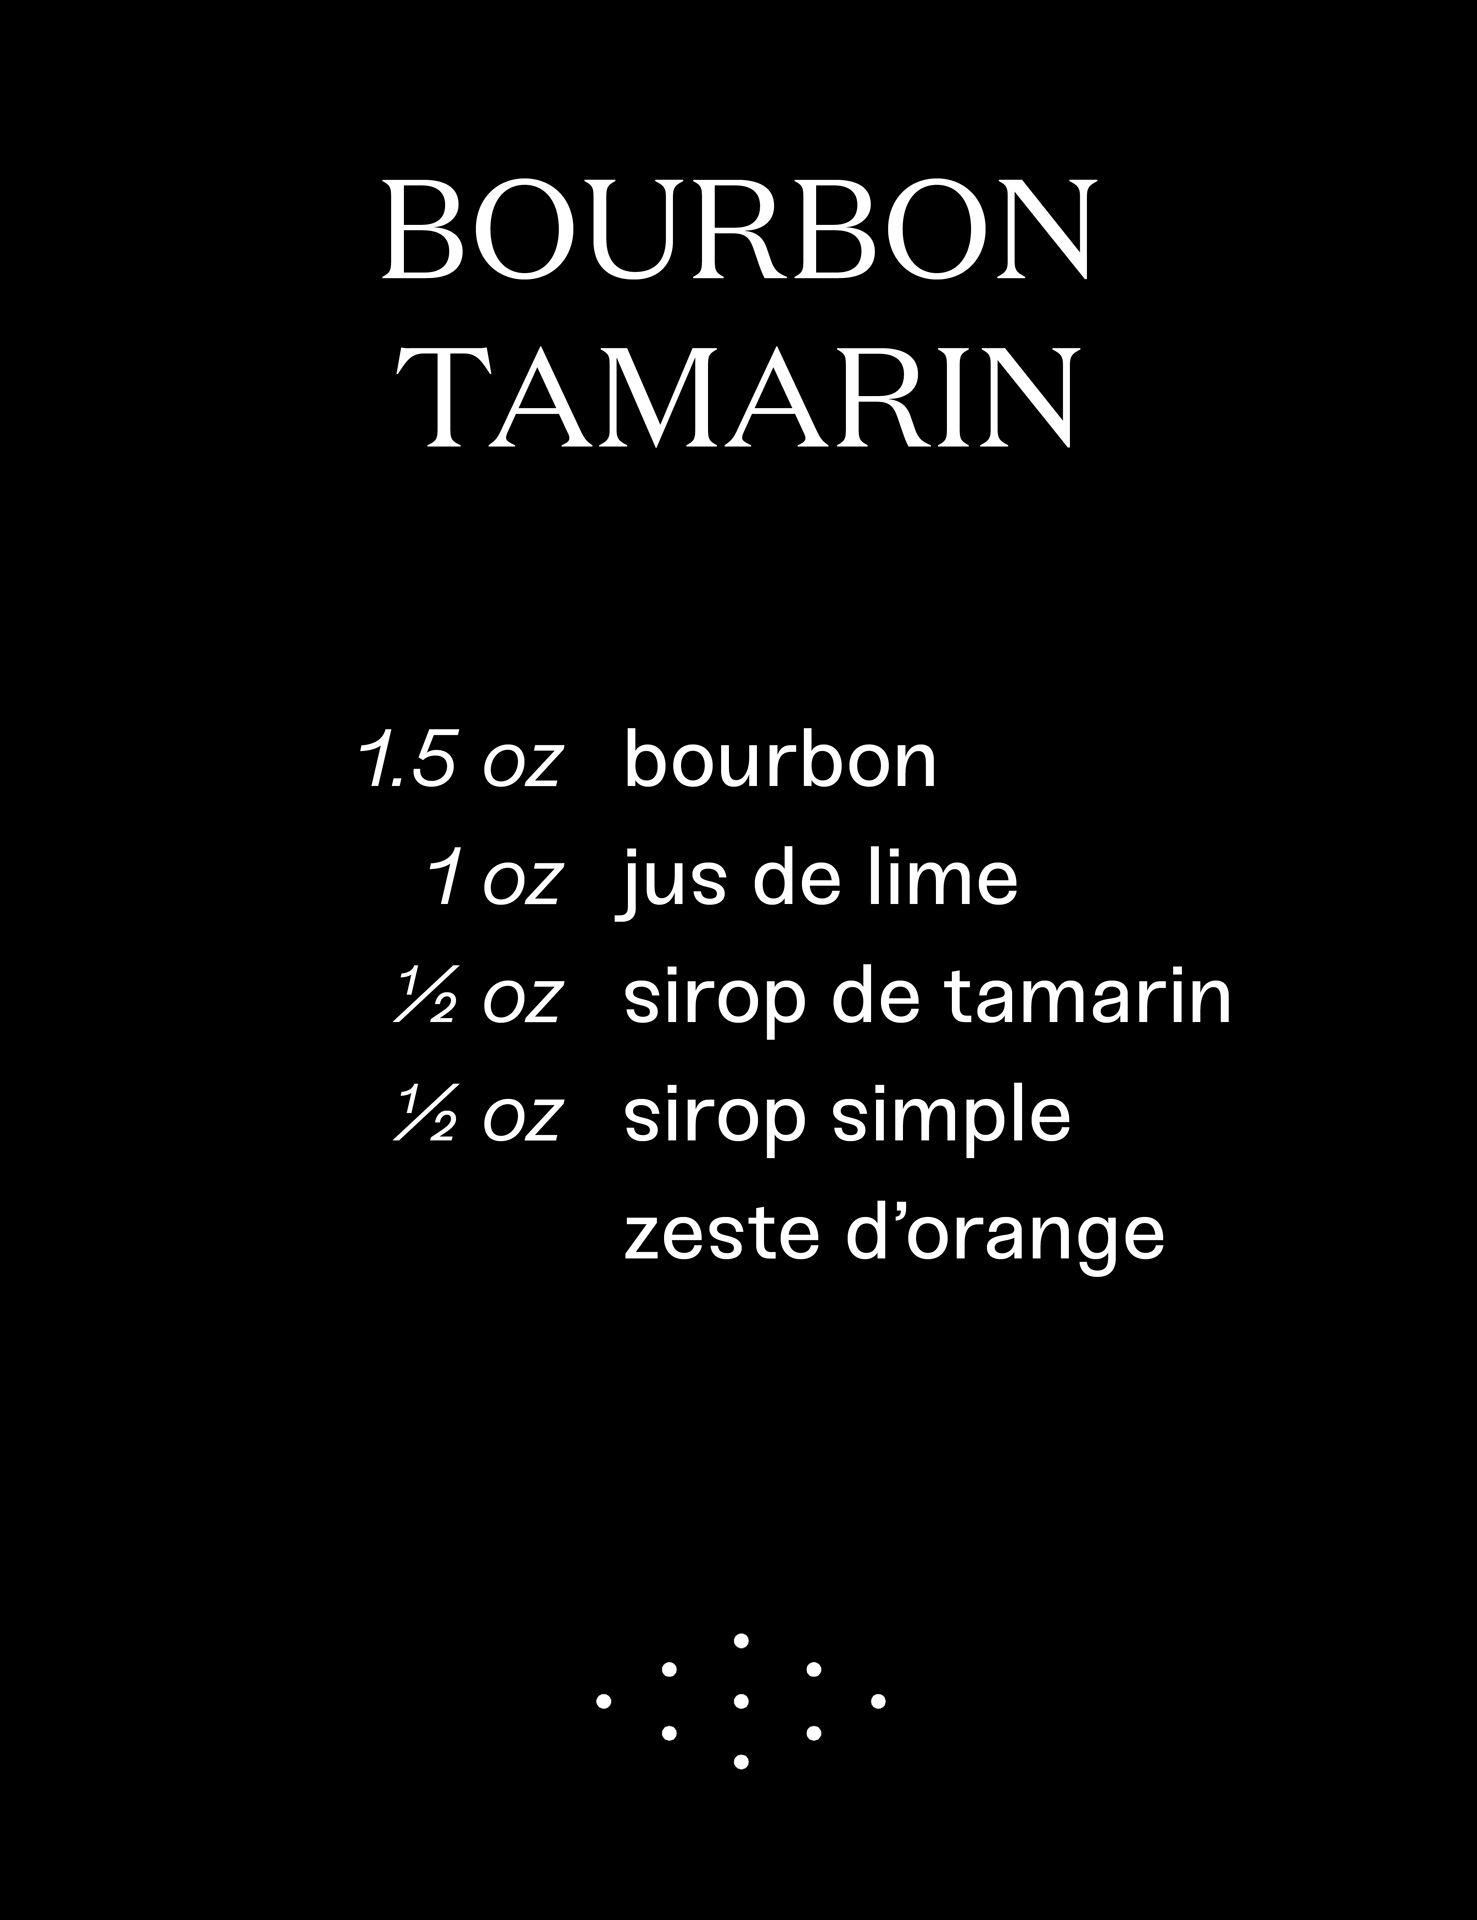 Bourbon Tamarin cocktail recipe